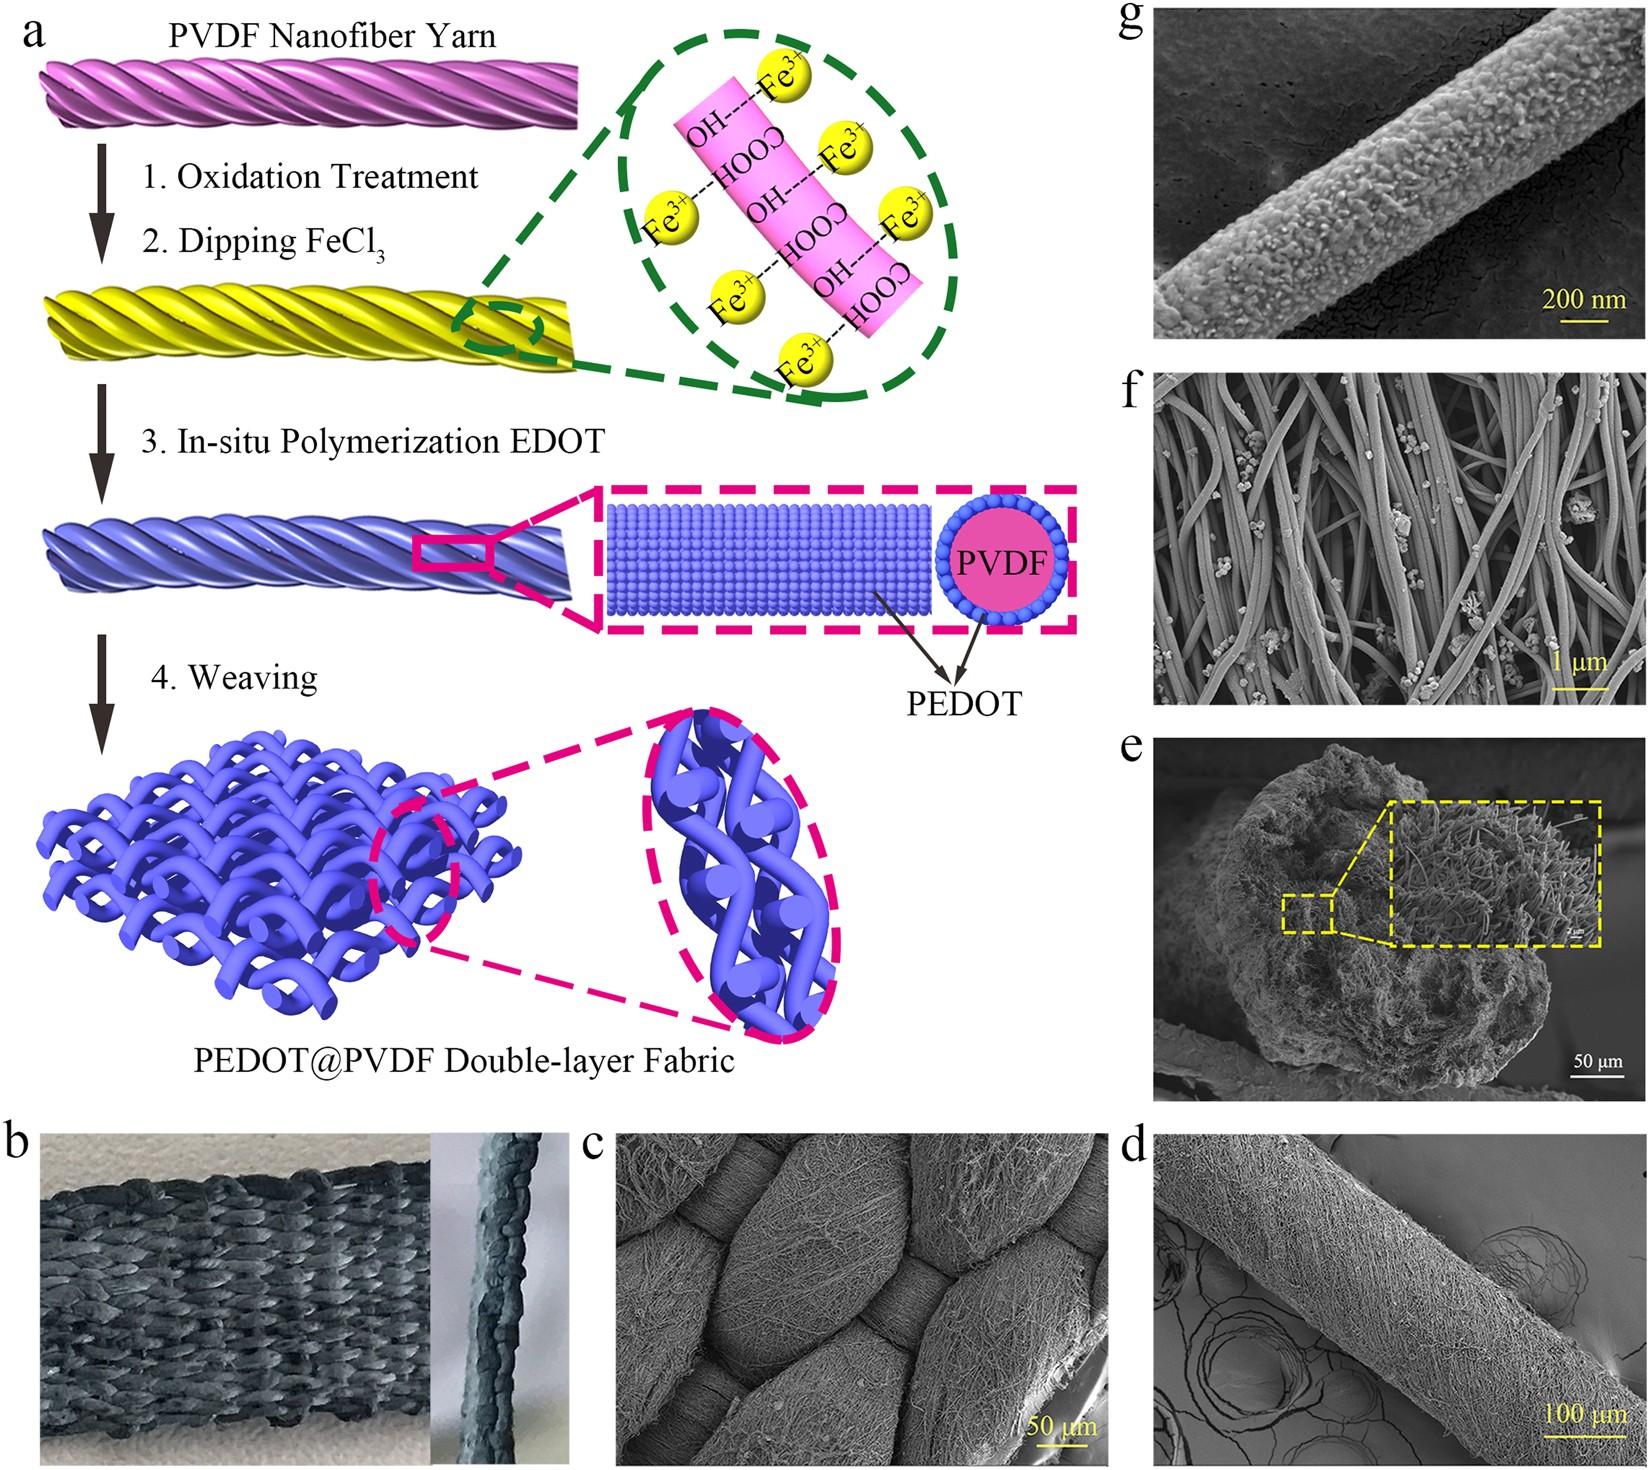 Highly Sensitive Self Powered And Wearable Electronic Skin Based On Optical Pressure Sensorworkingconstructioncircuit Diagram Nanofiber Woven Fabric Sensor Scientific Reports